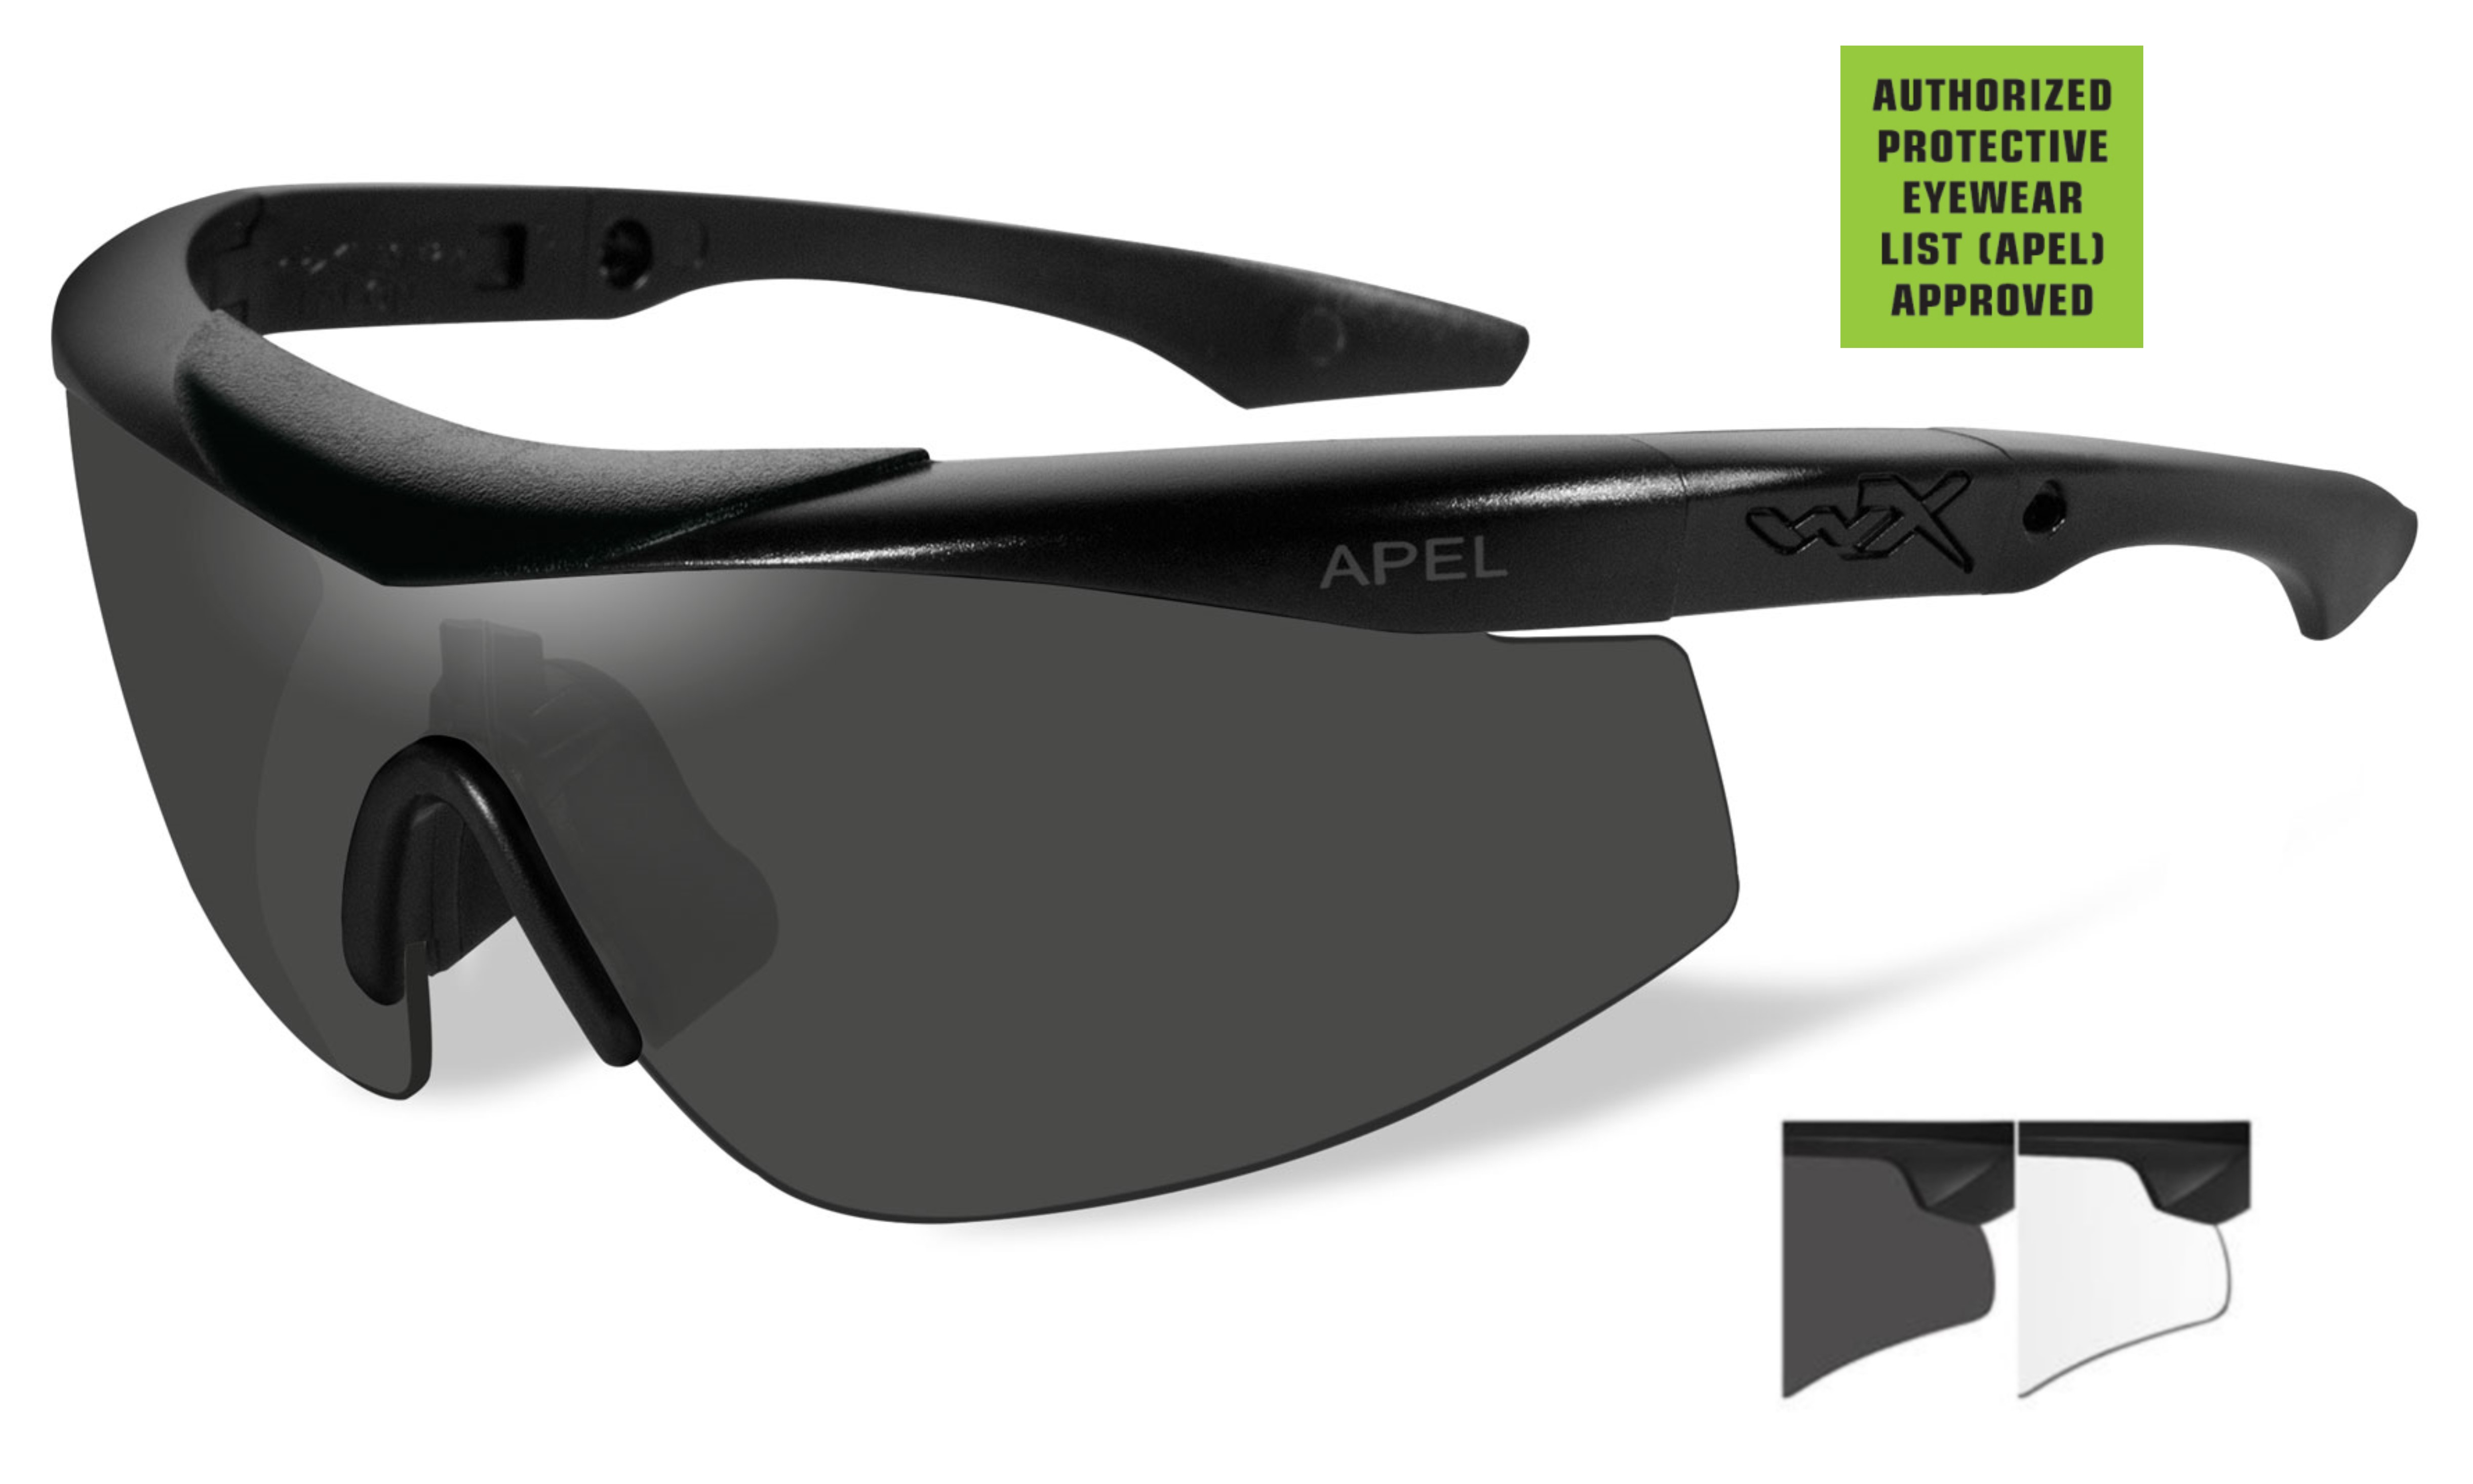 WX Talon Advanced - APEL Image